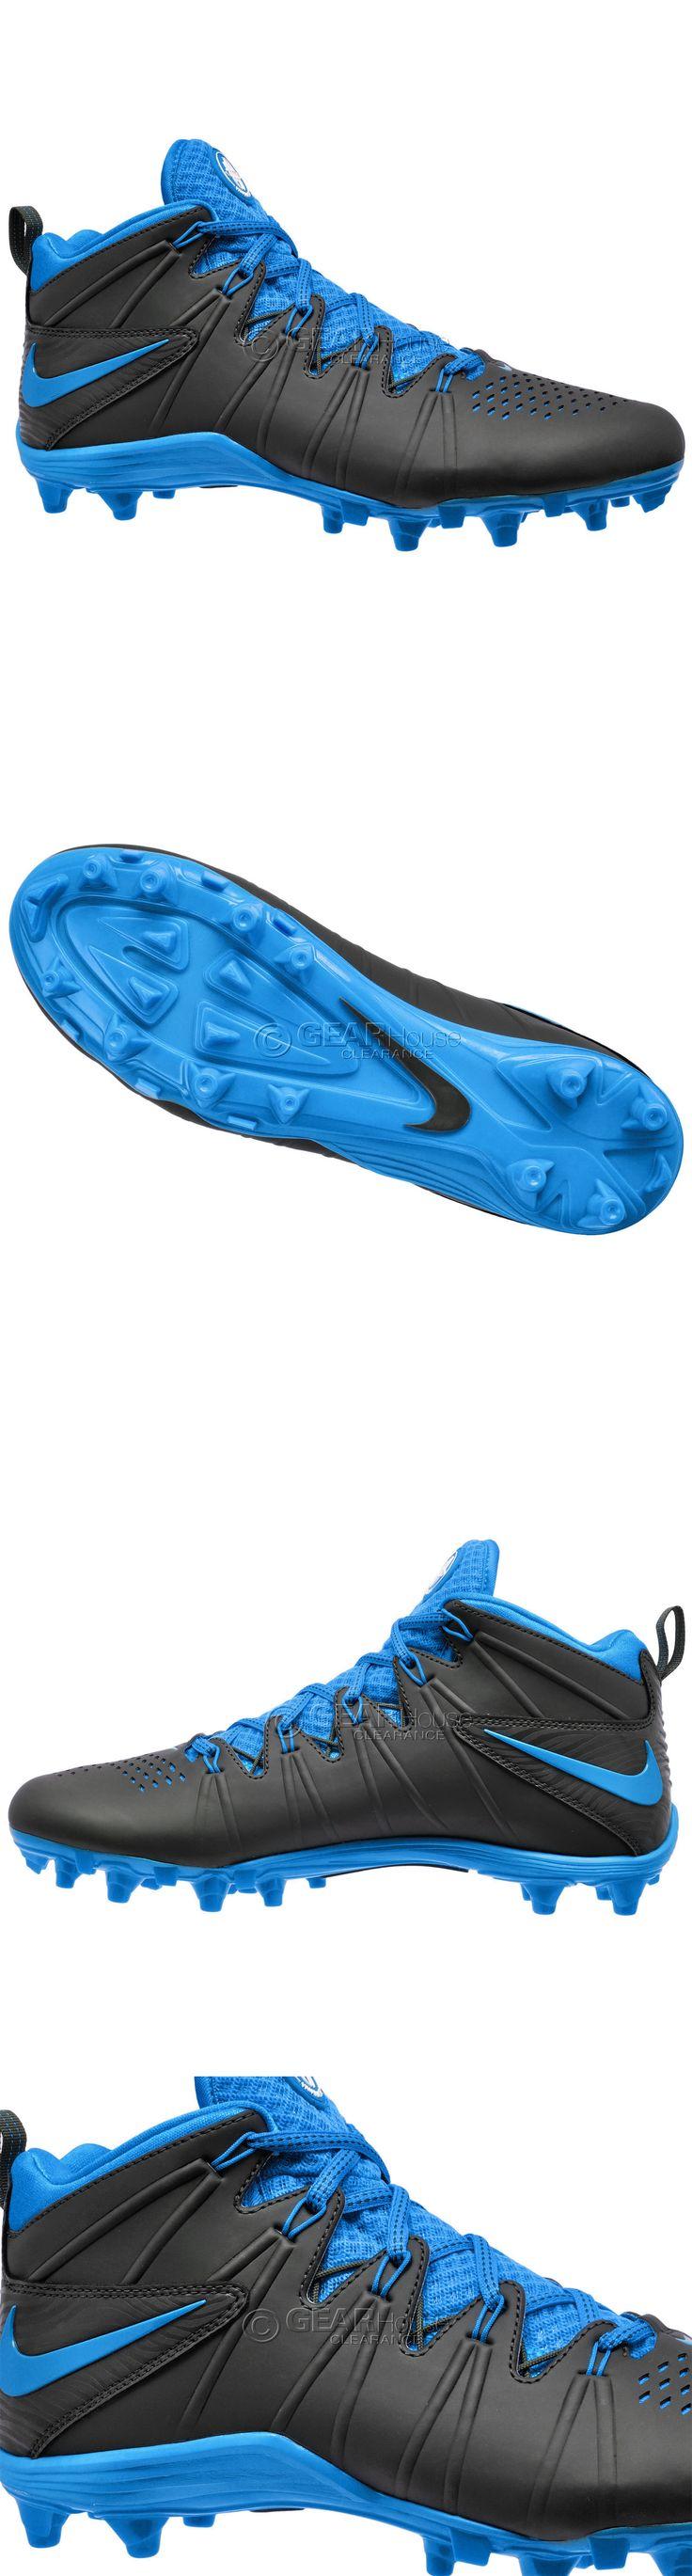 Footwear 159154: New Nike Huarache 4 Iv Lax Mid Mens Lacrosse Cleats Football Lx : Black Blue -> BUY IT NOW ONLY: $35.8 on eBay!